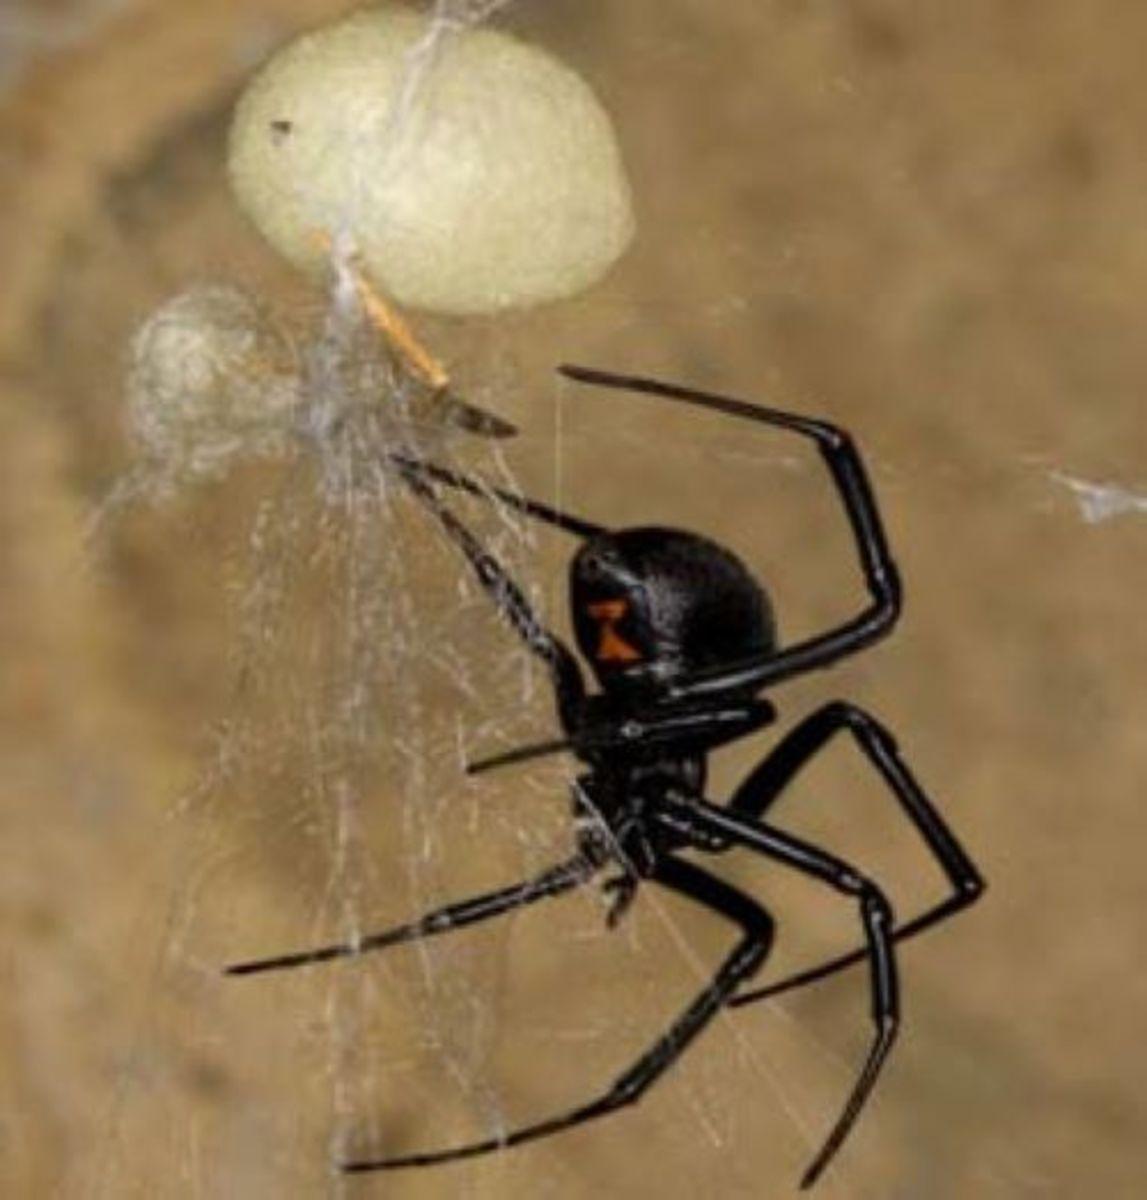 Black Widow alongside egg sac.